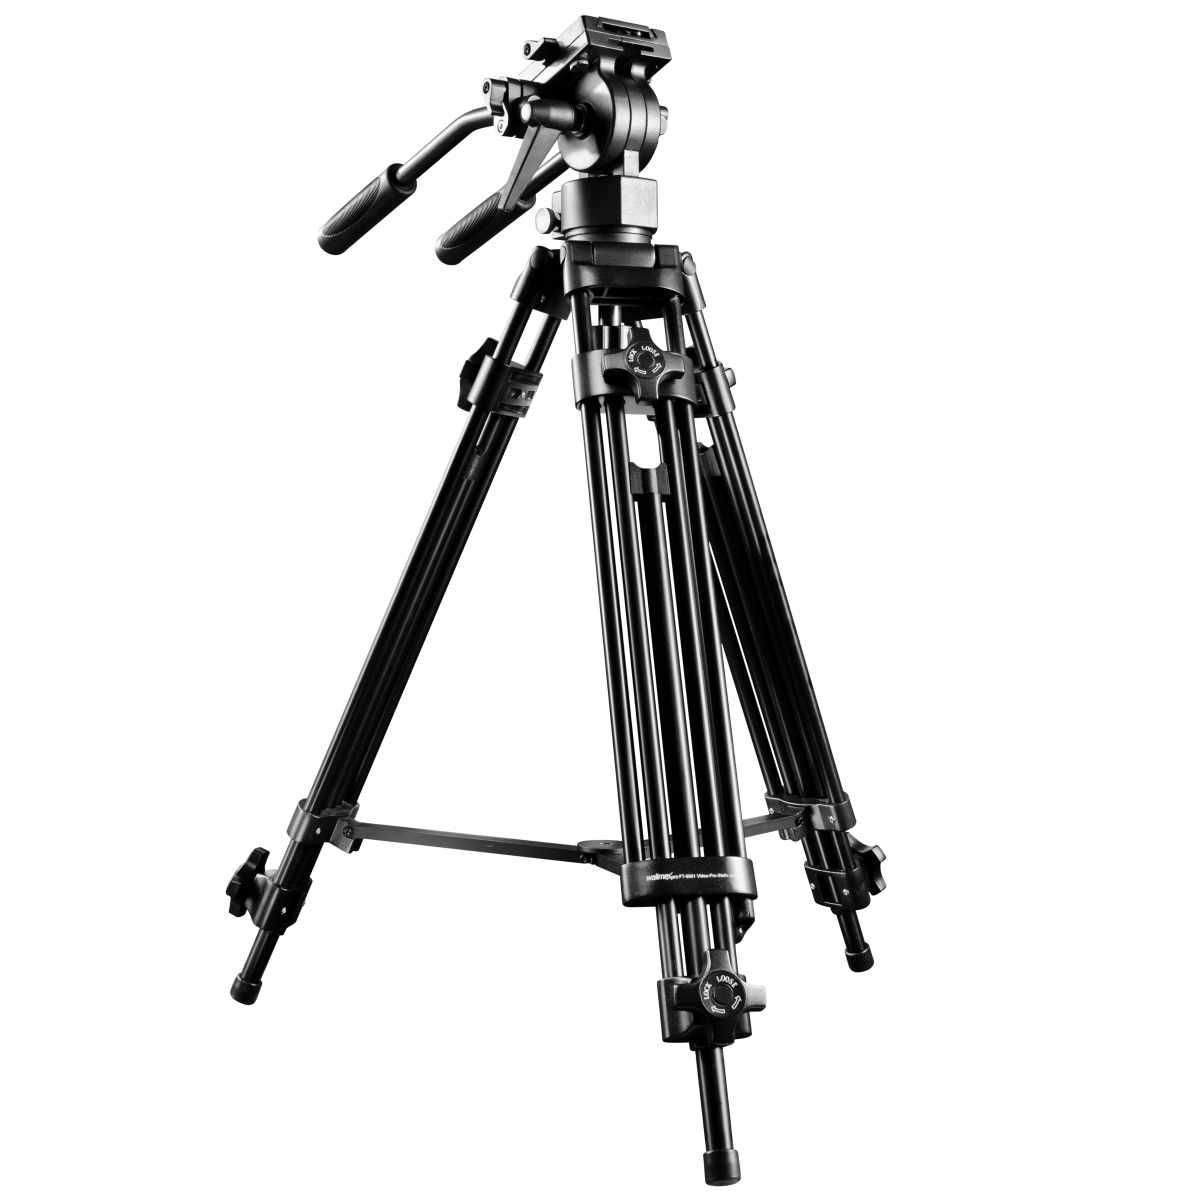 Walimex pro EI-9901 Video-Pro-Tripod, 138cm